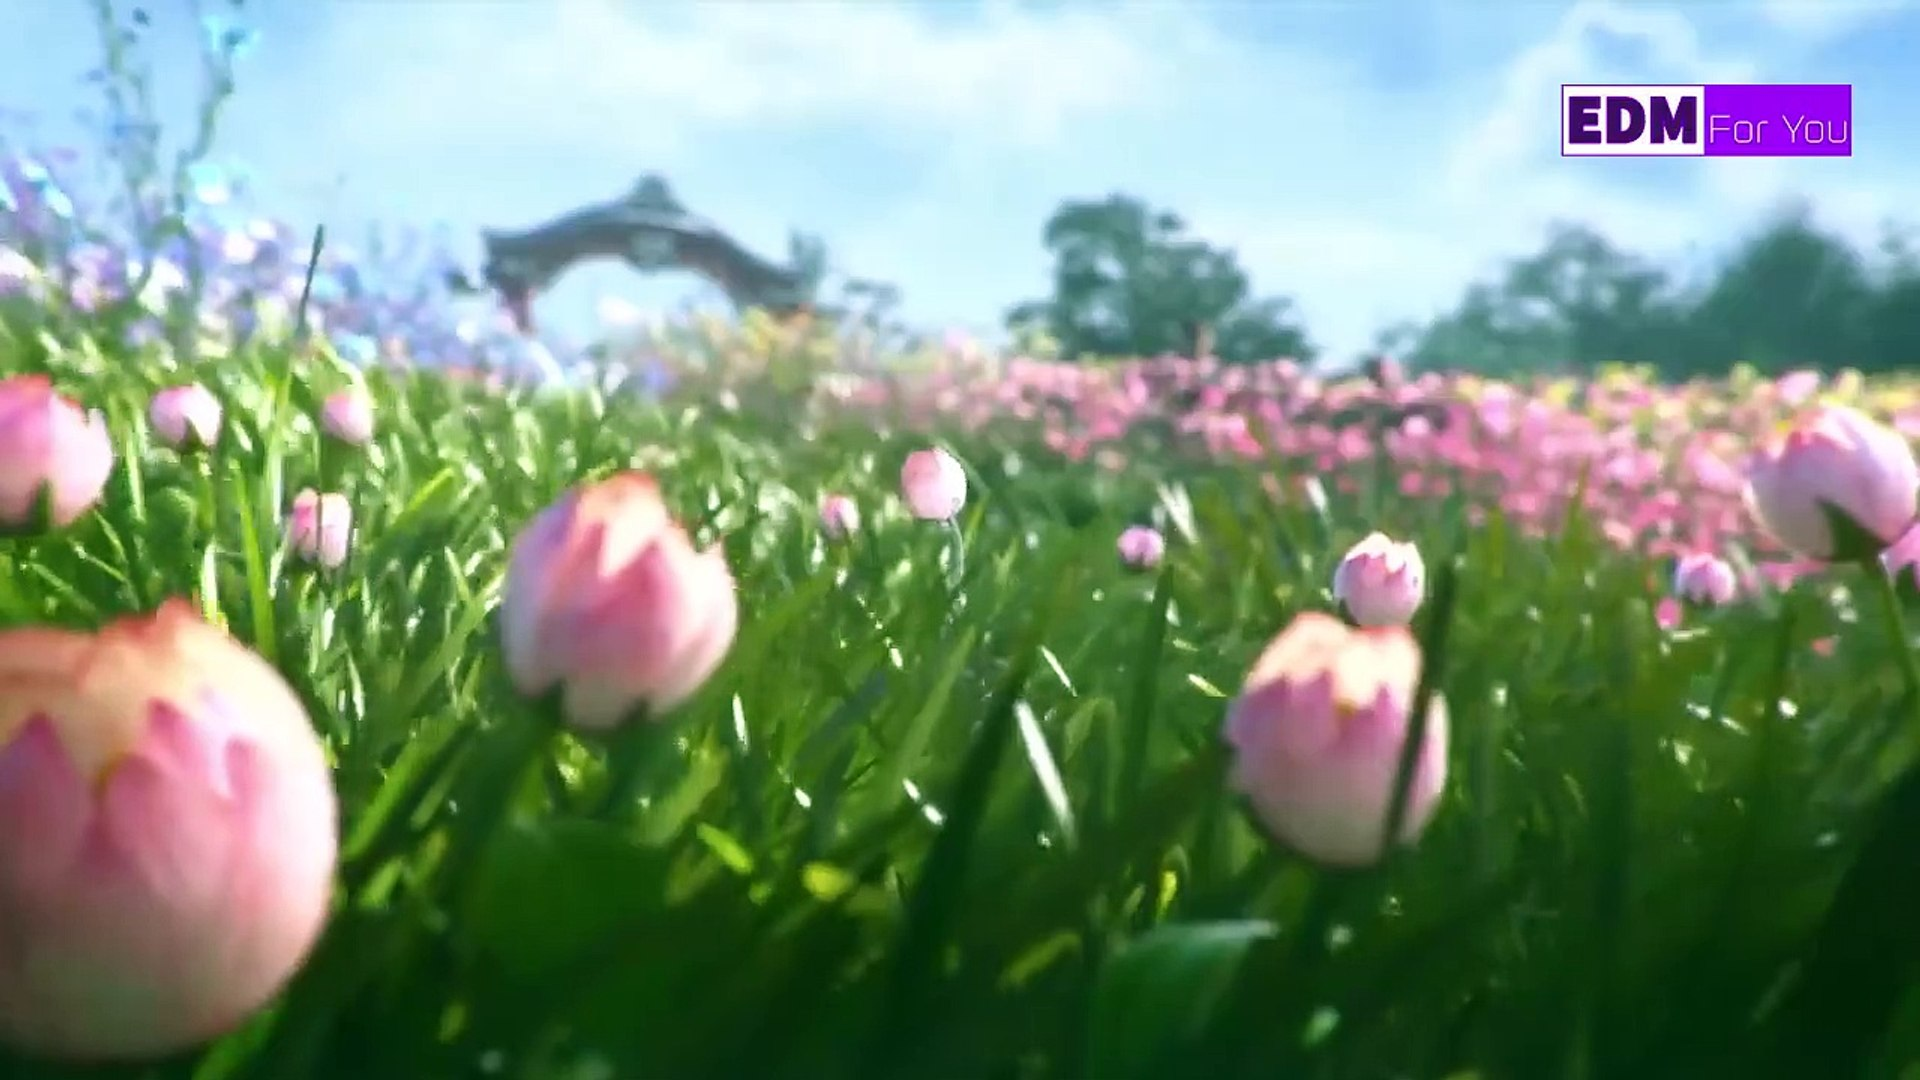 New Songs Alan Walker (Remix) - Top Alan Walker Style 2021 - Animation Music Video [GMV] P2